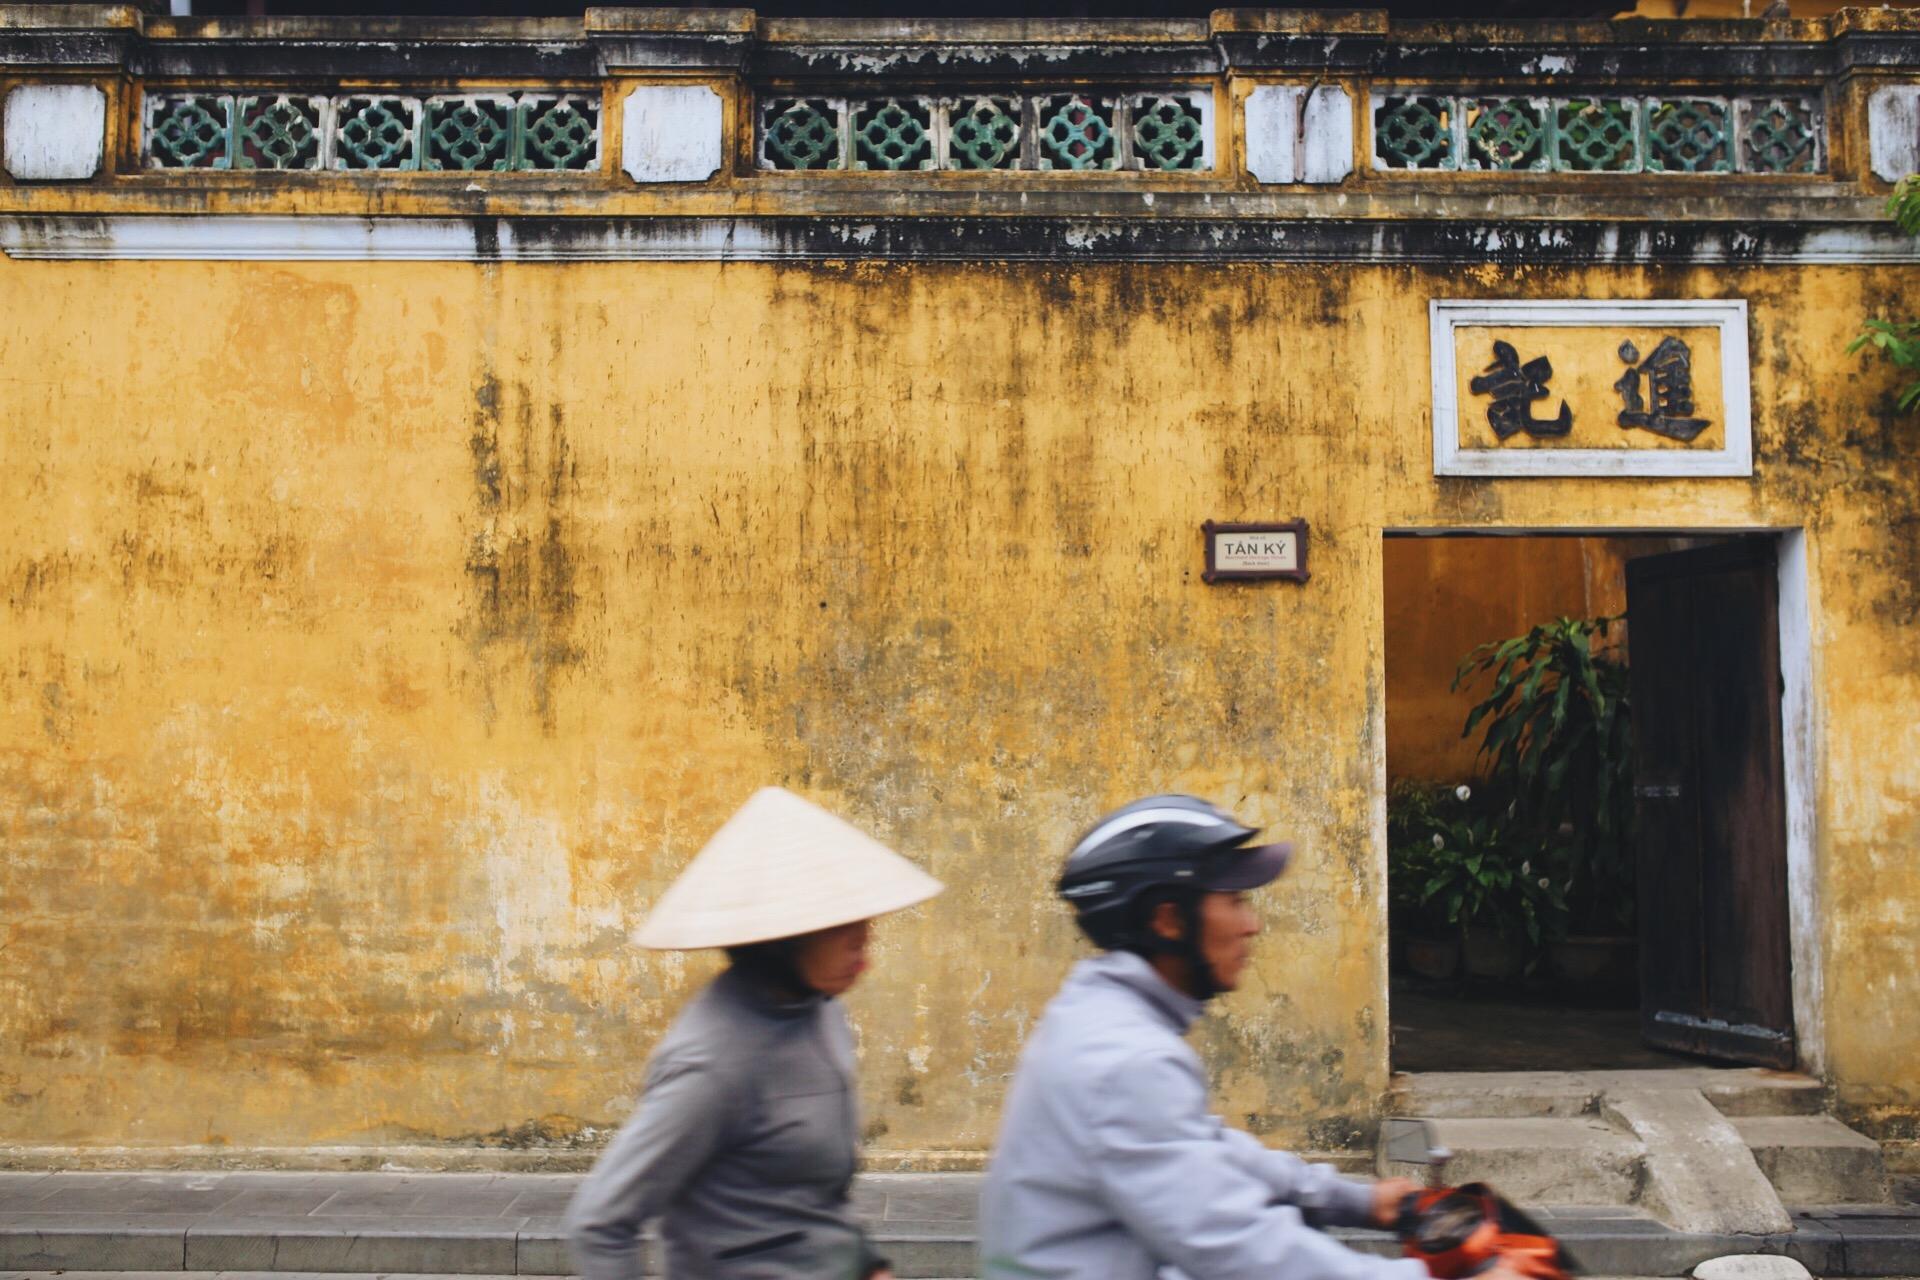 voyage-vietnam-16jours.JPG